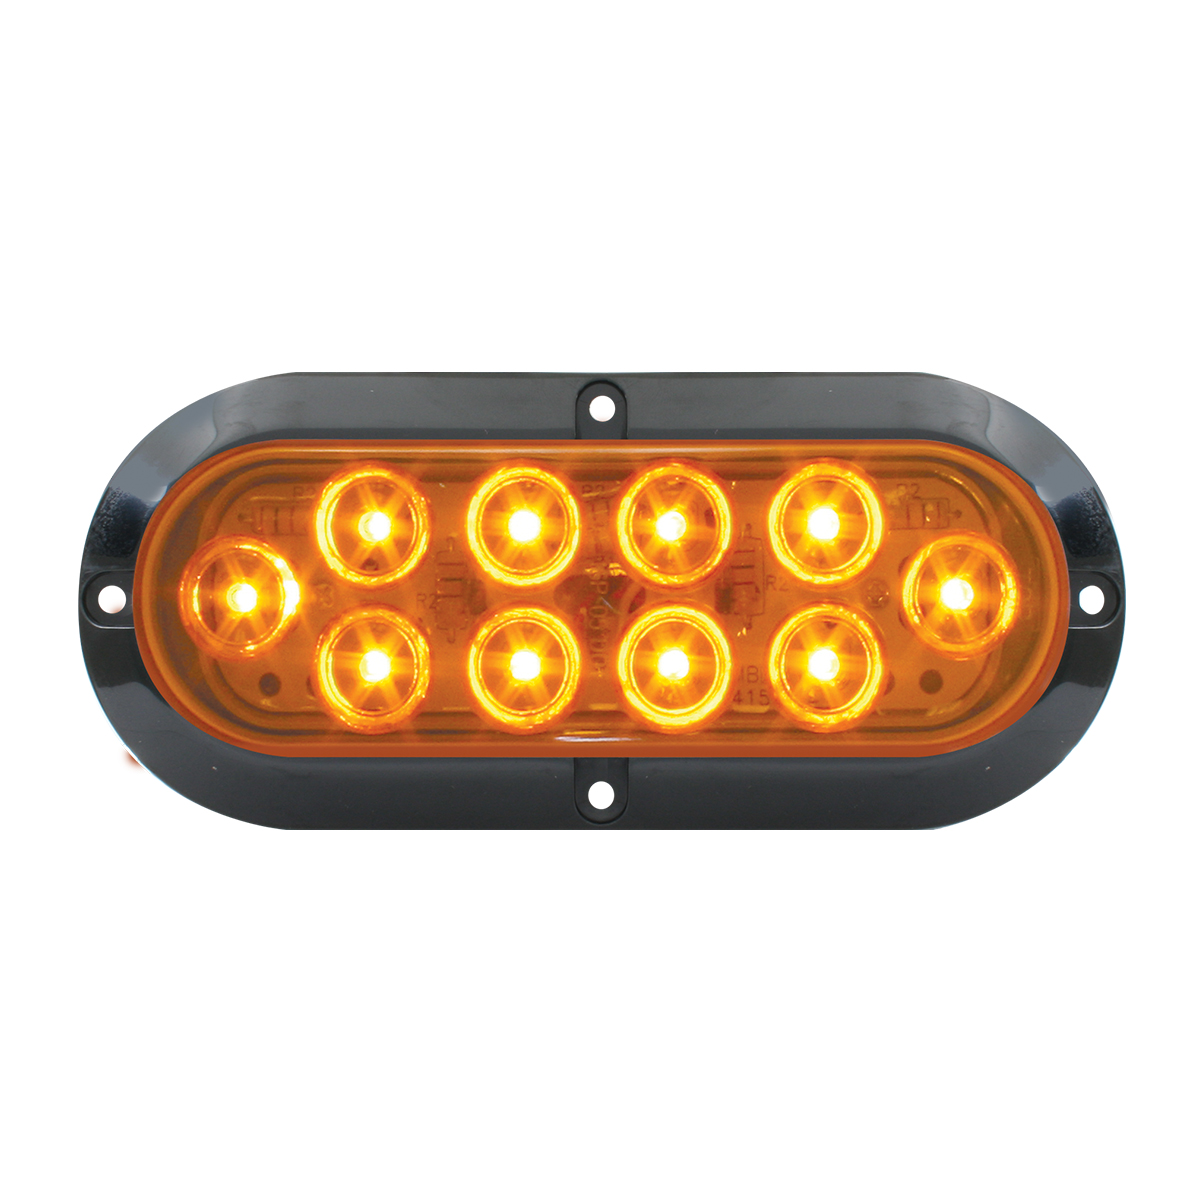 77430 Surface Mount Oval Mega 10 LED Light